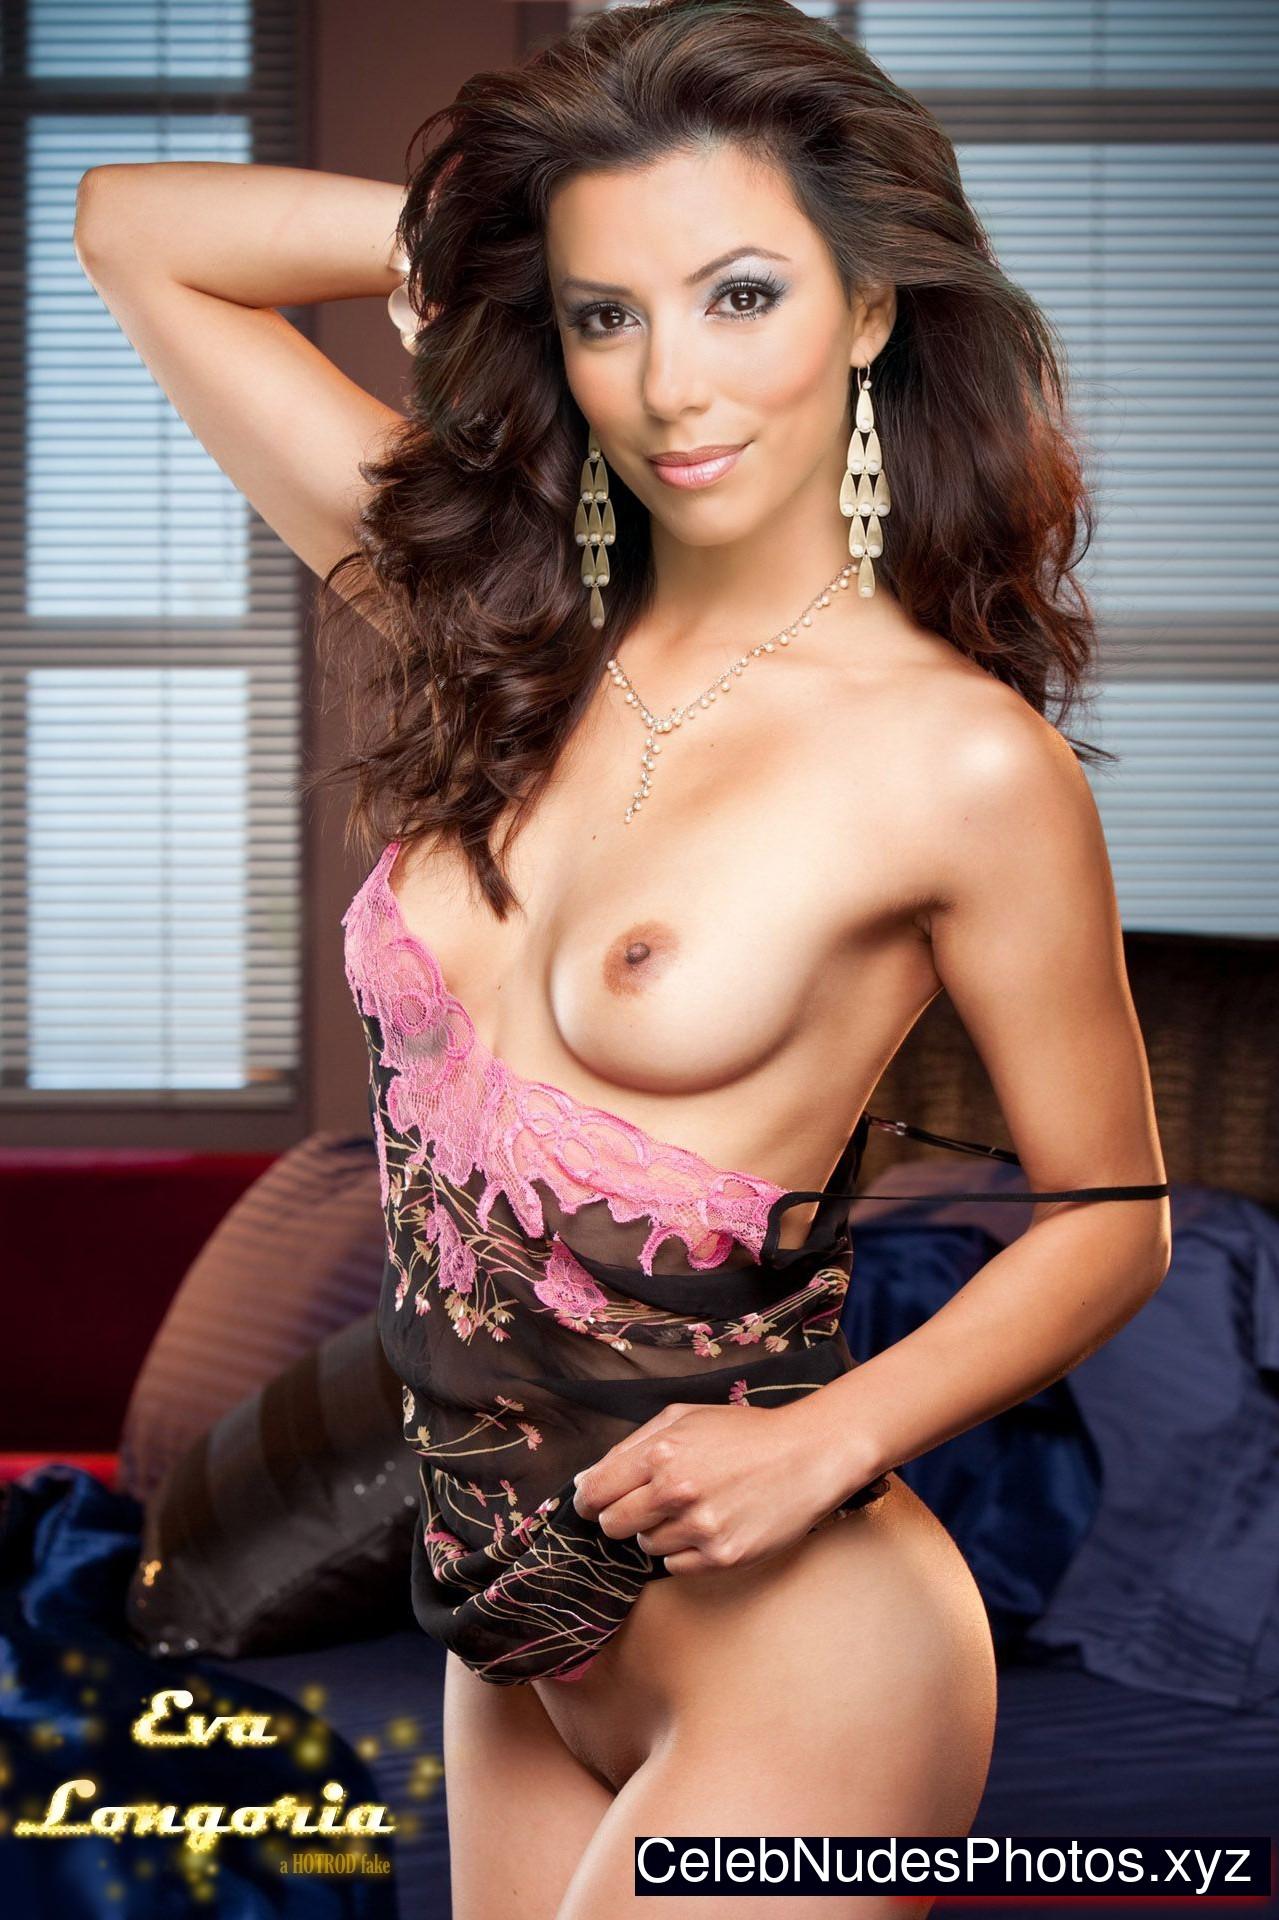 Eva Longoria Real Celebrity Nude sexy 11